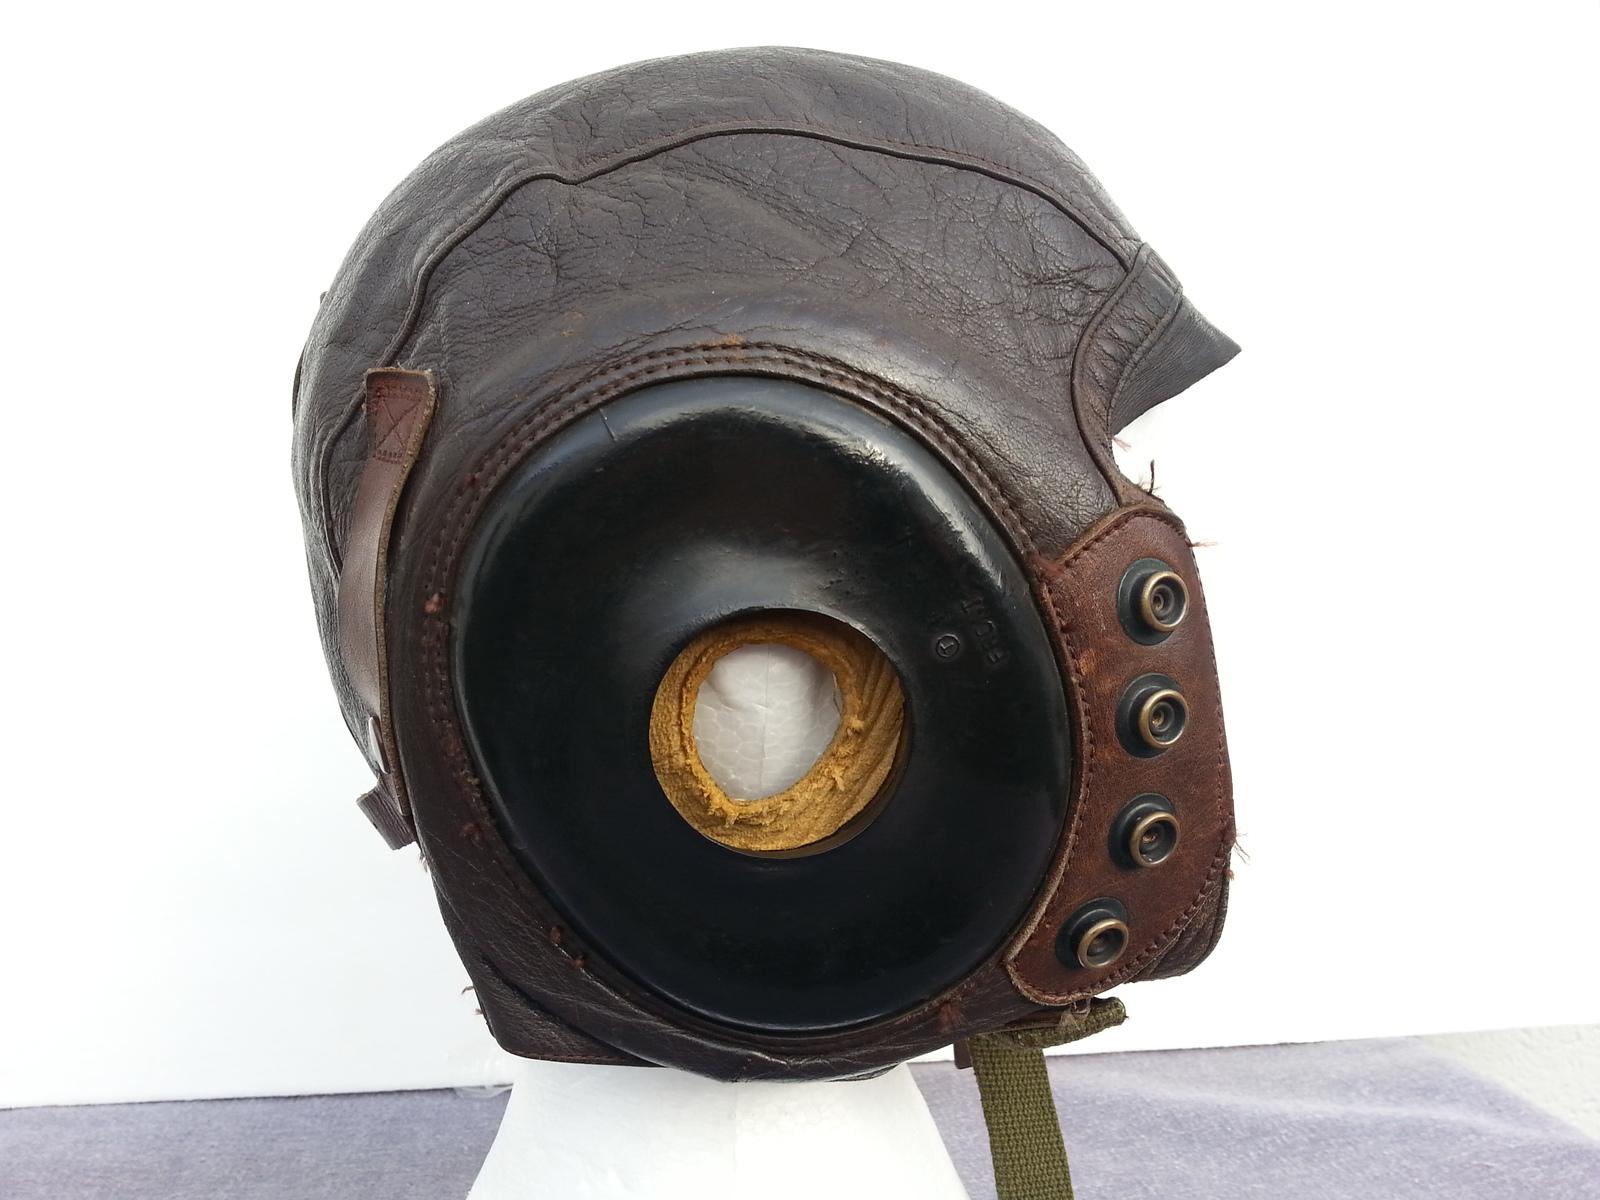 WW II Army Air Force Leather Flying Helmet - Intermediate Flying - Type A-11